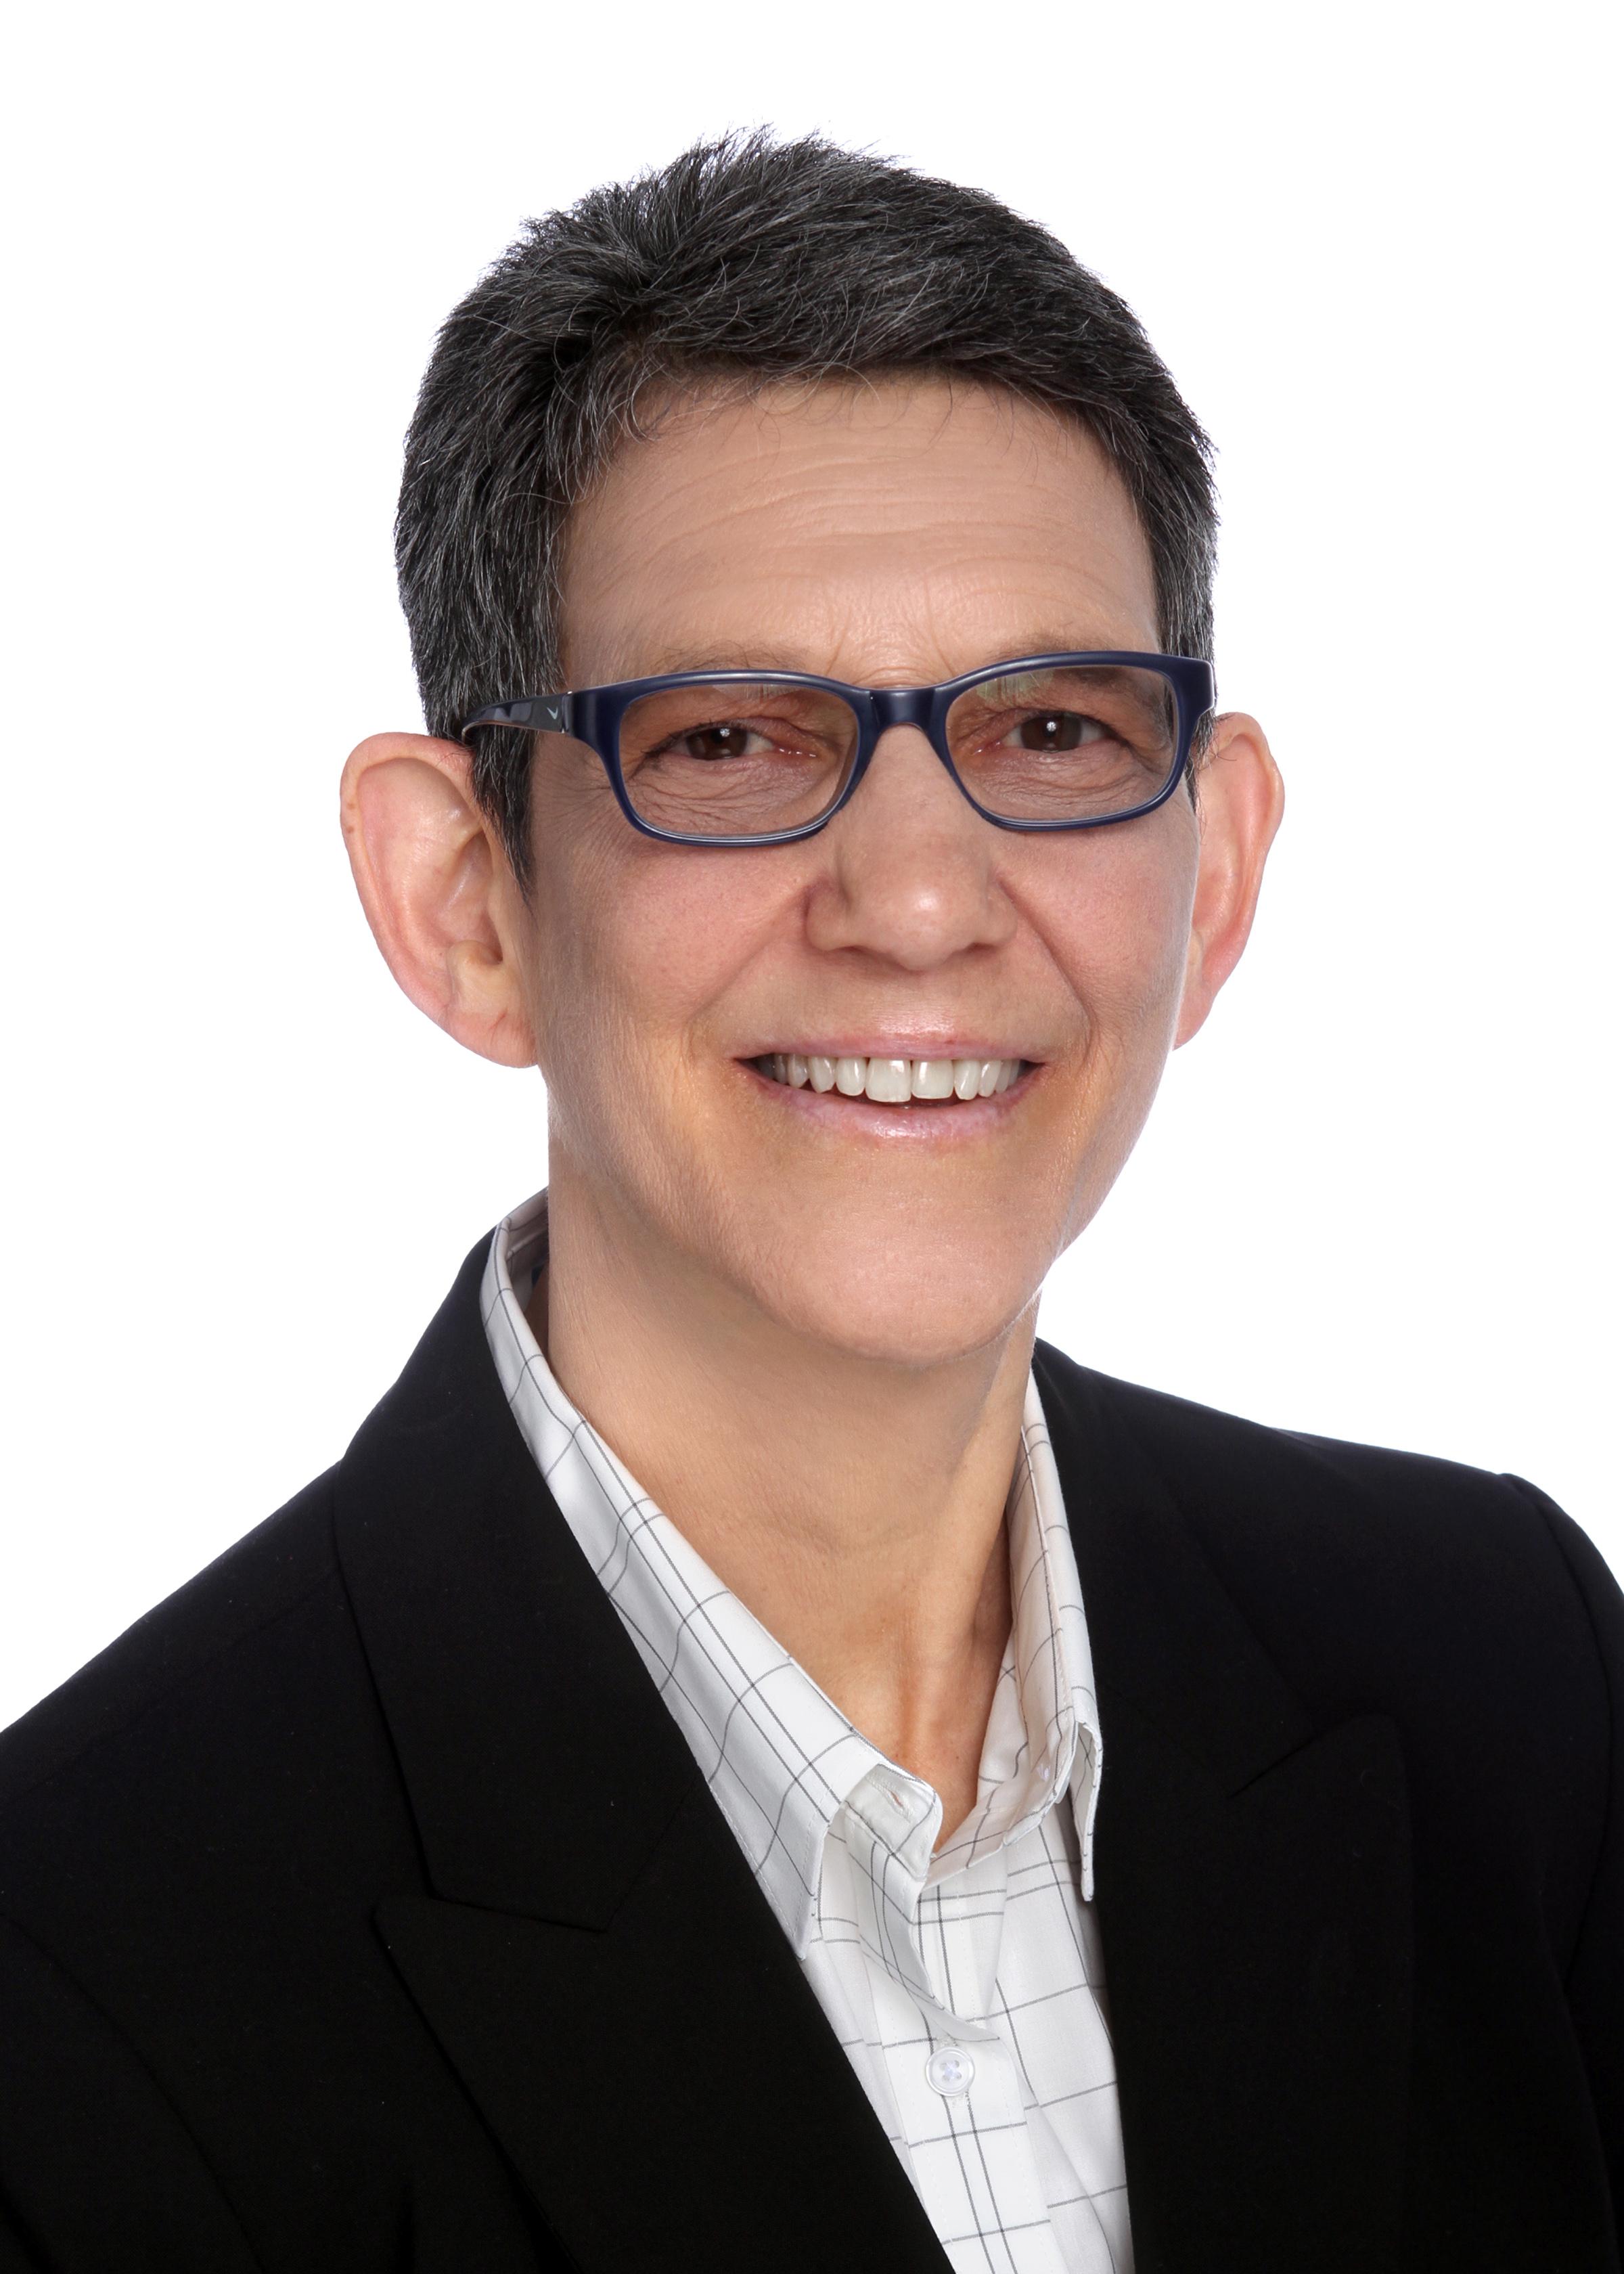 Lizbeth Dornfeld